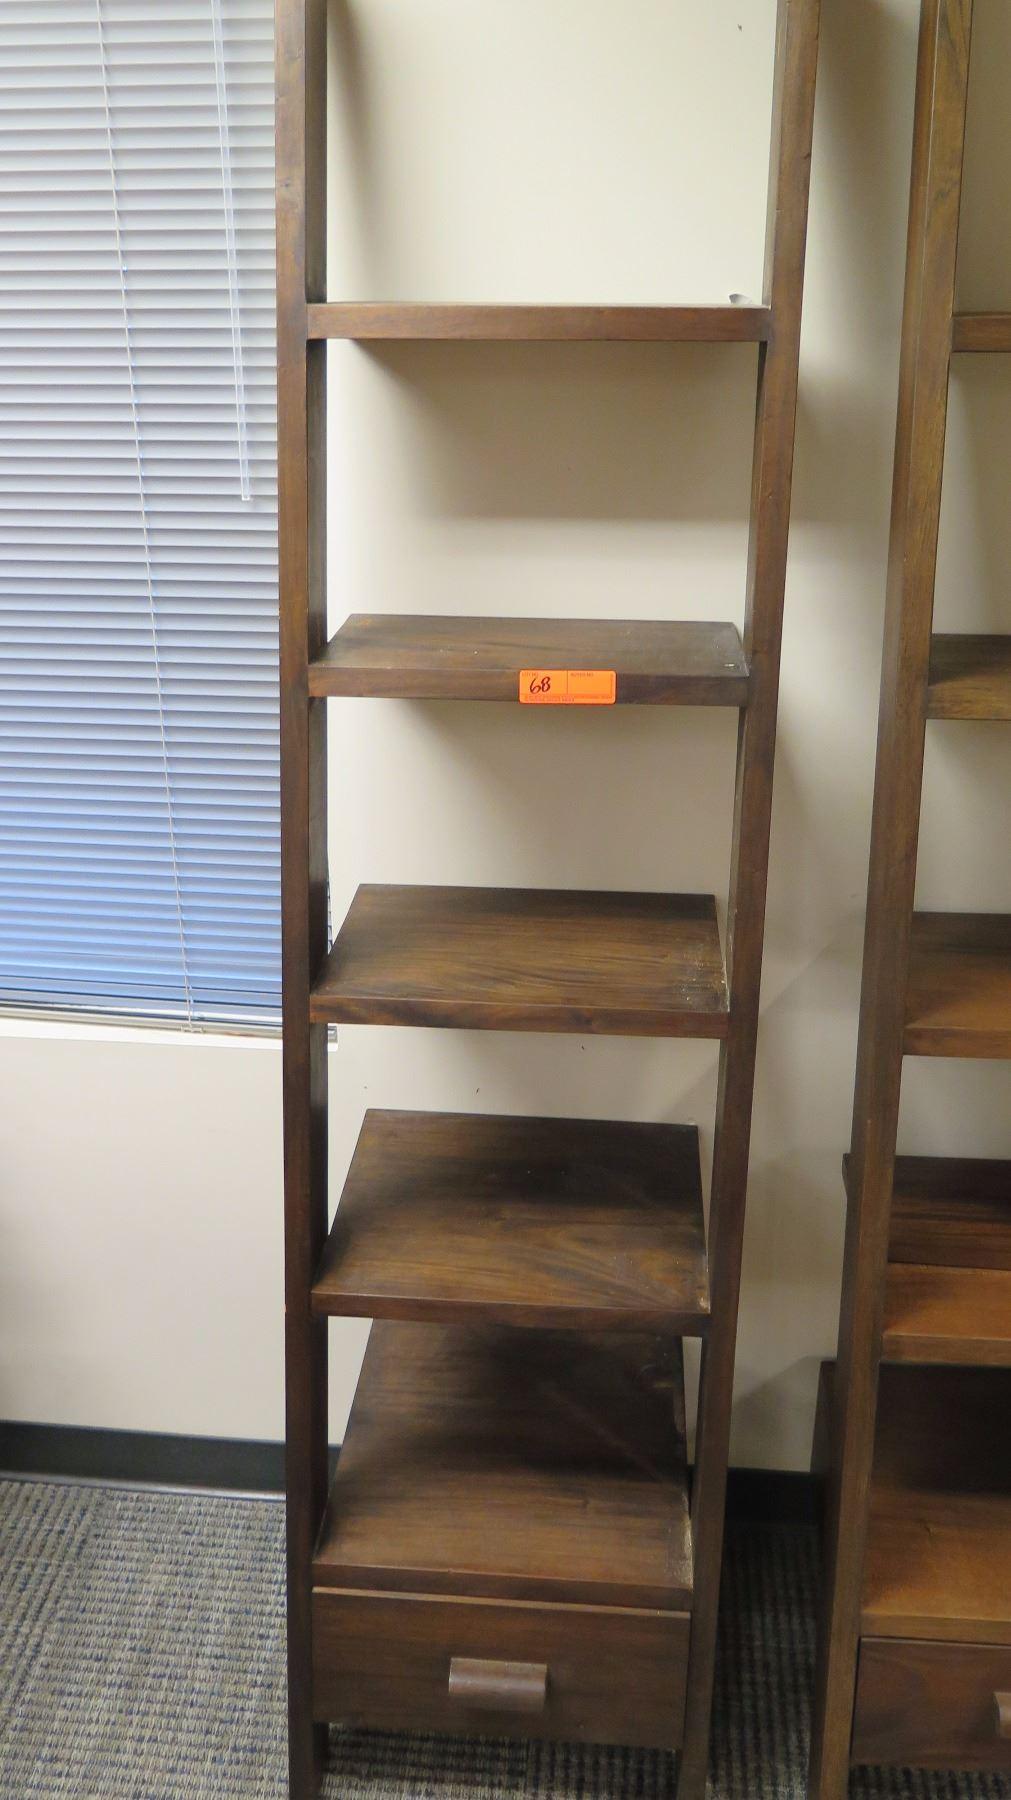 Image 1 Furniture Wooden Shelving Unit 5 Shelves Bottom Drawer